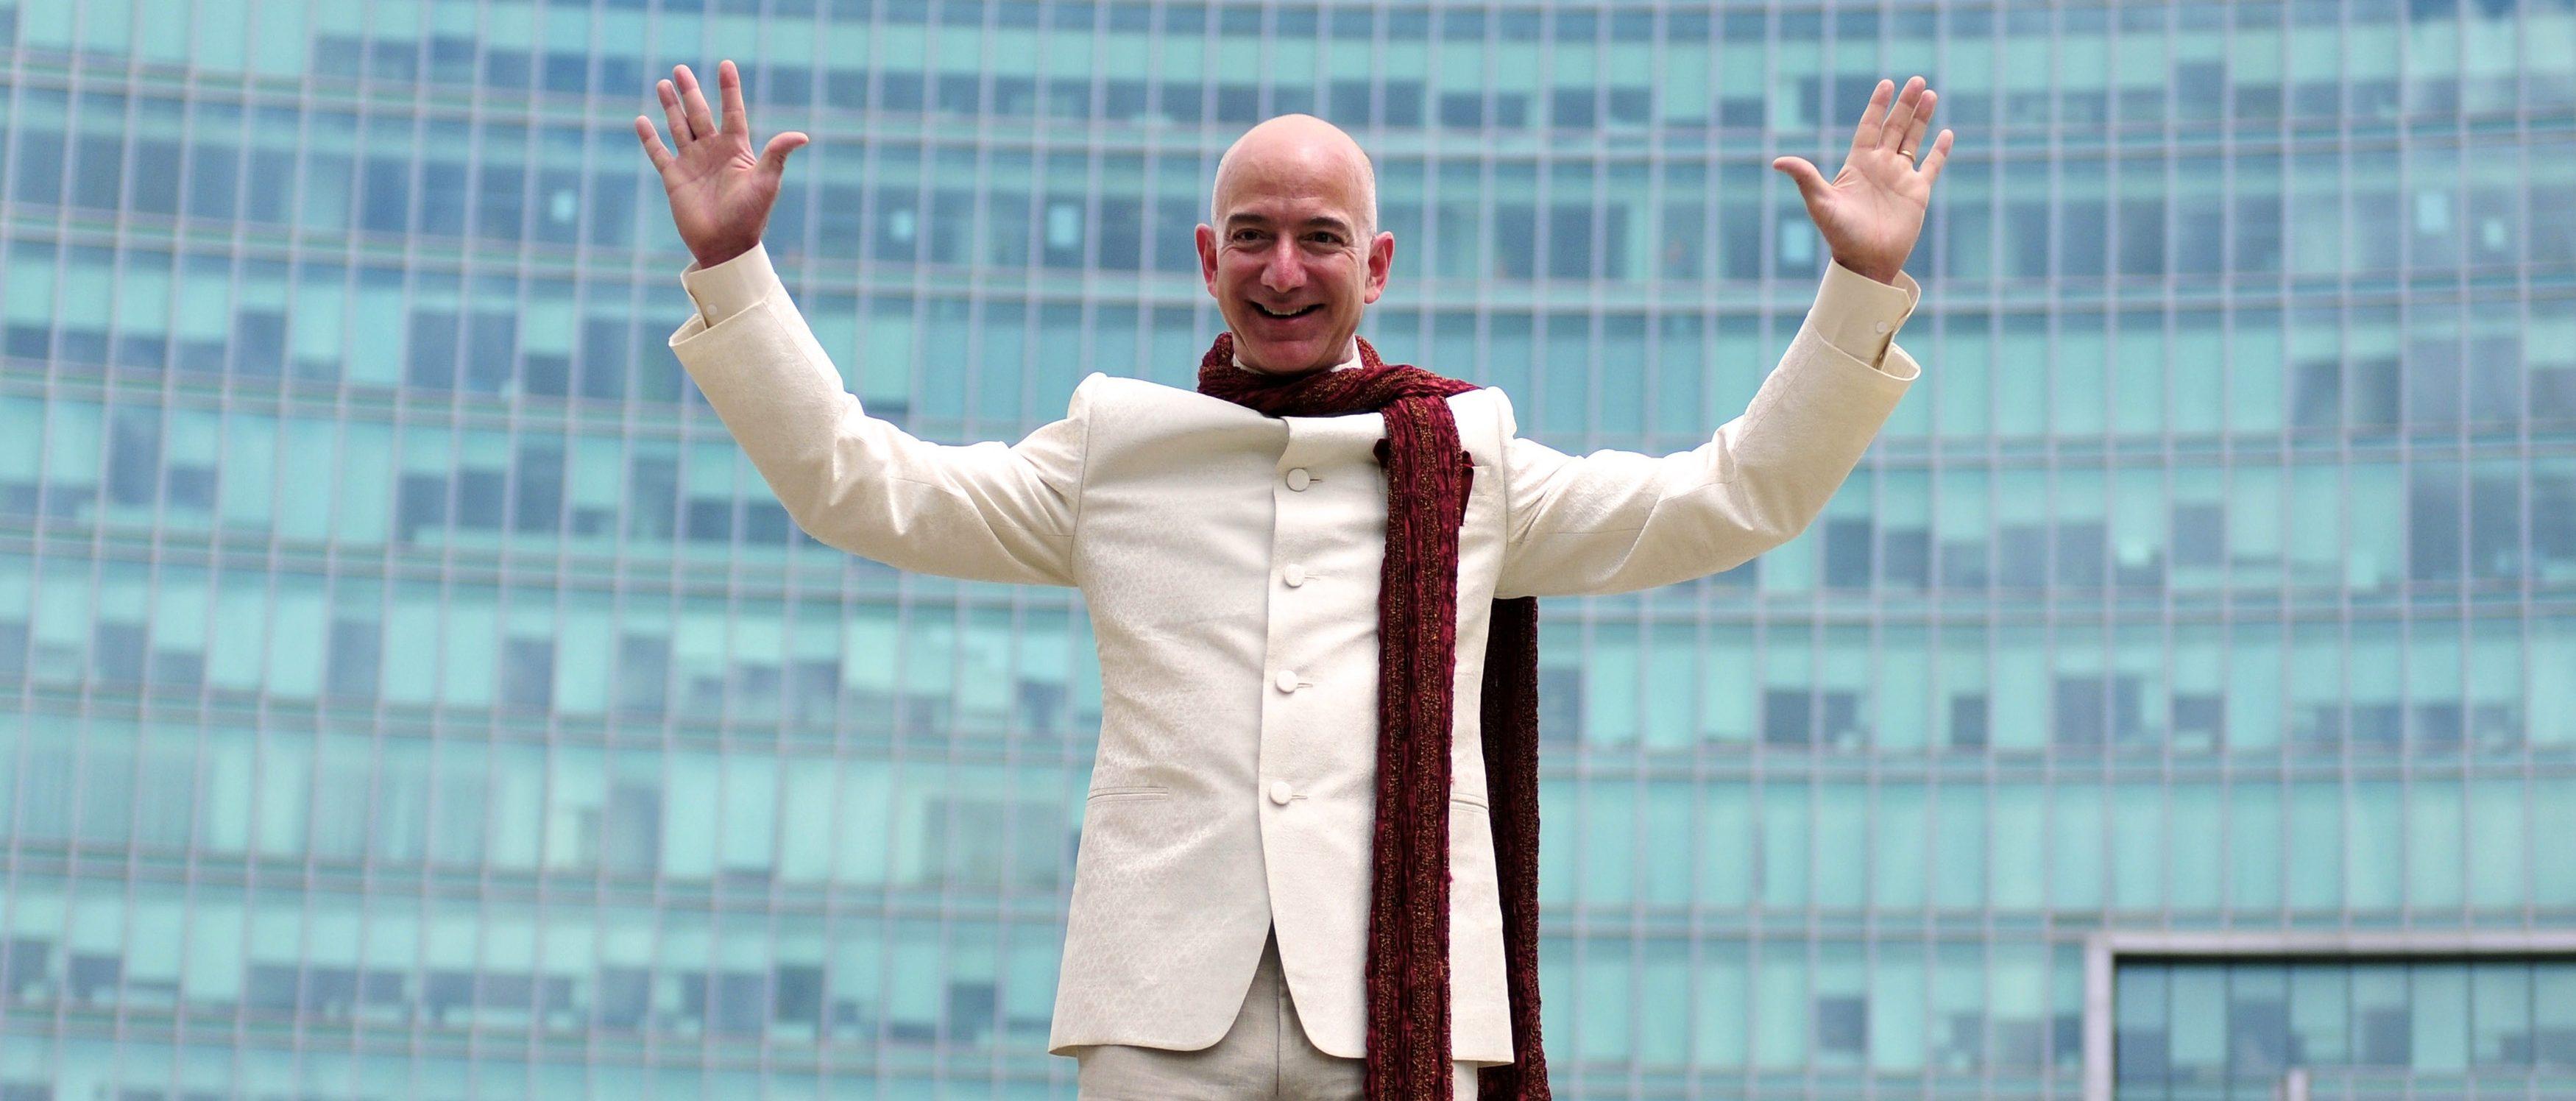 To Master Health Care Amazon Amzn And Jeff Bezos Must